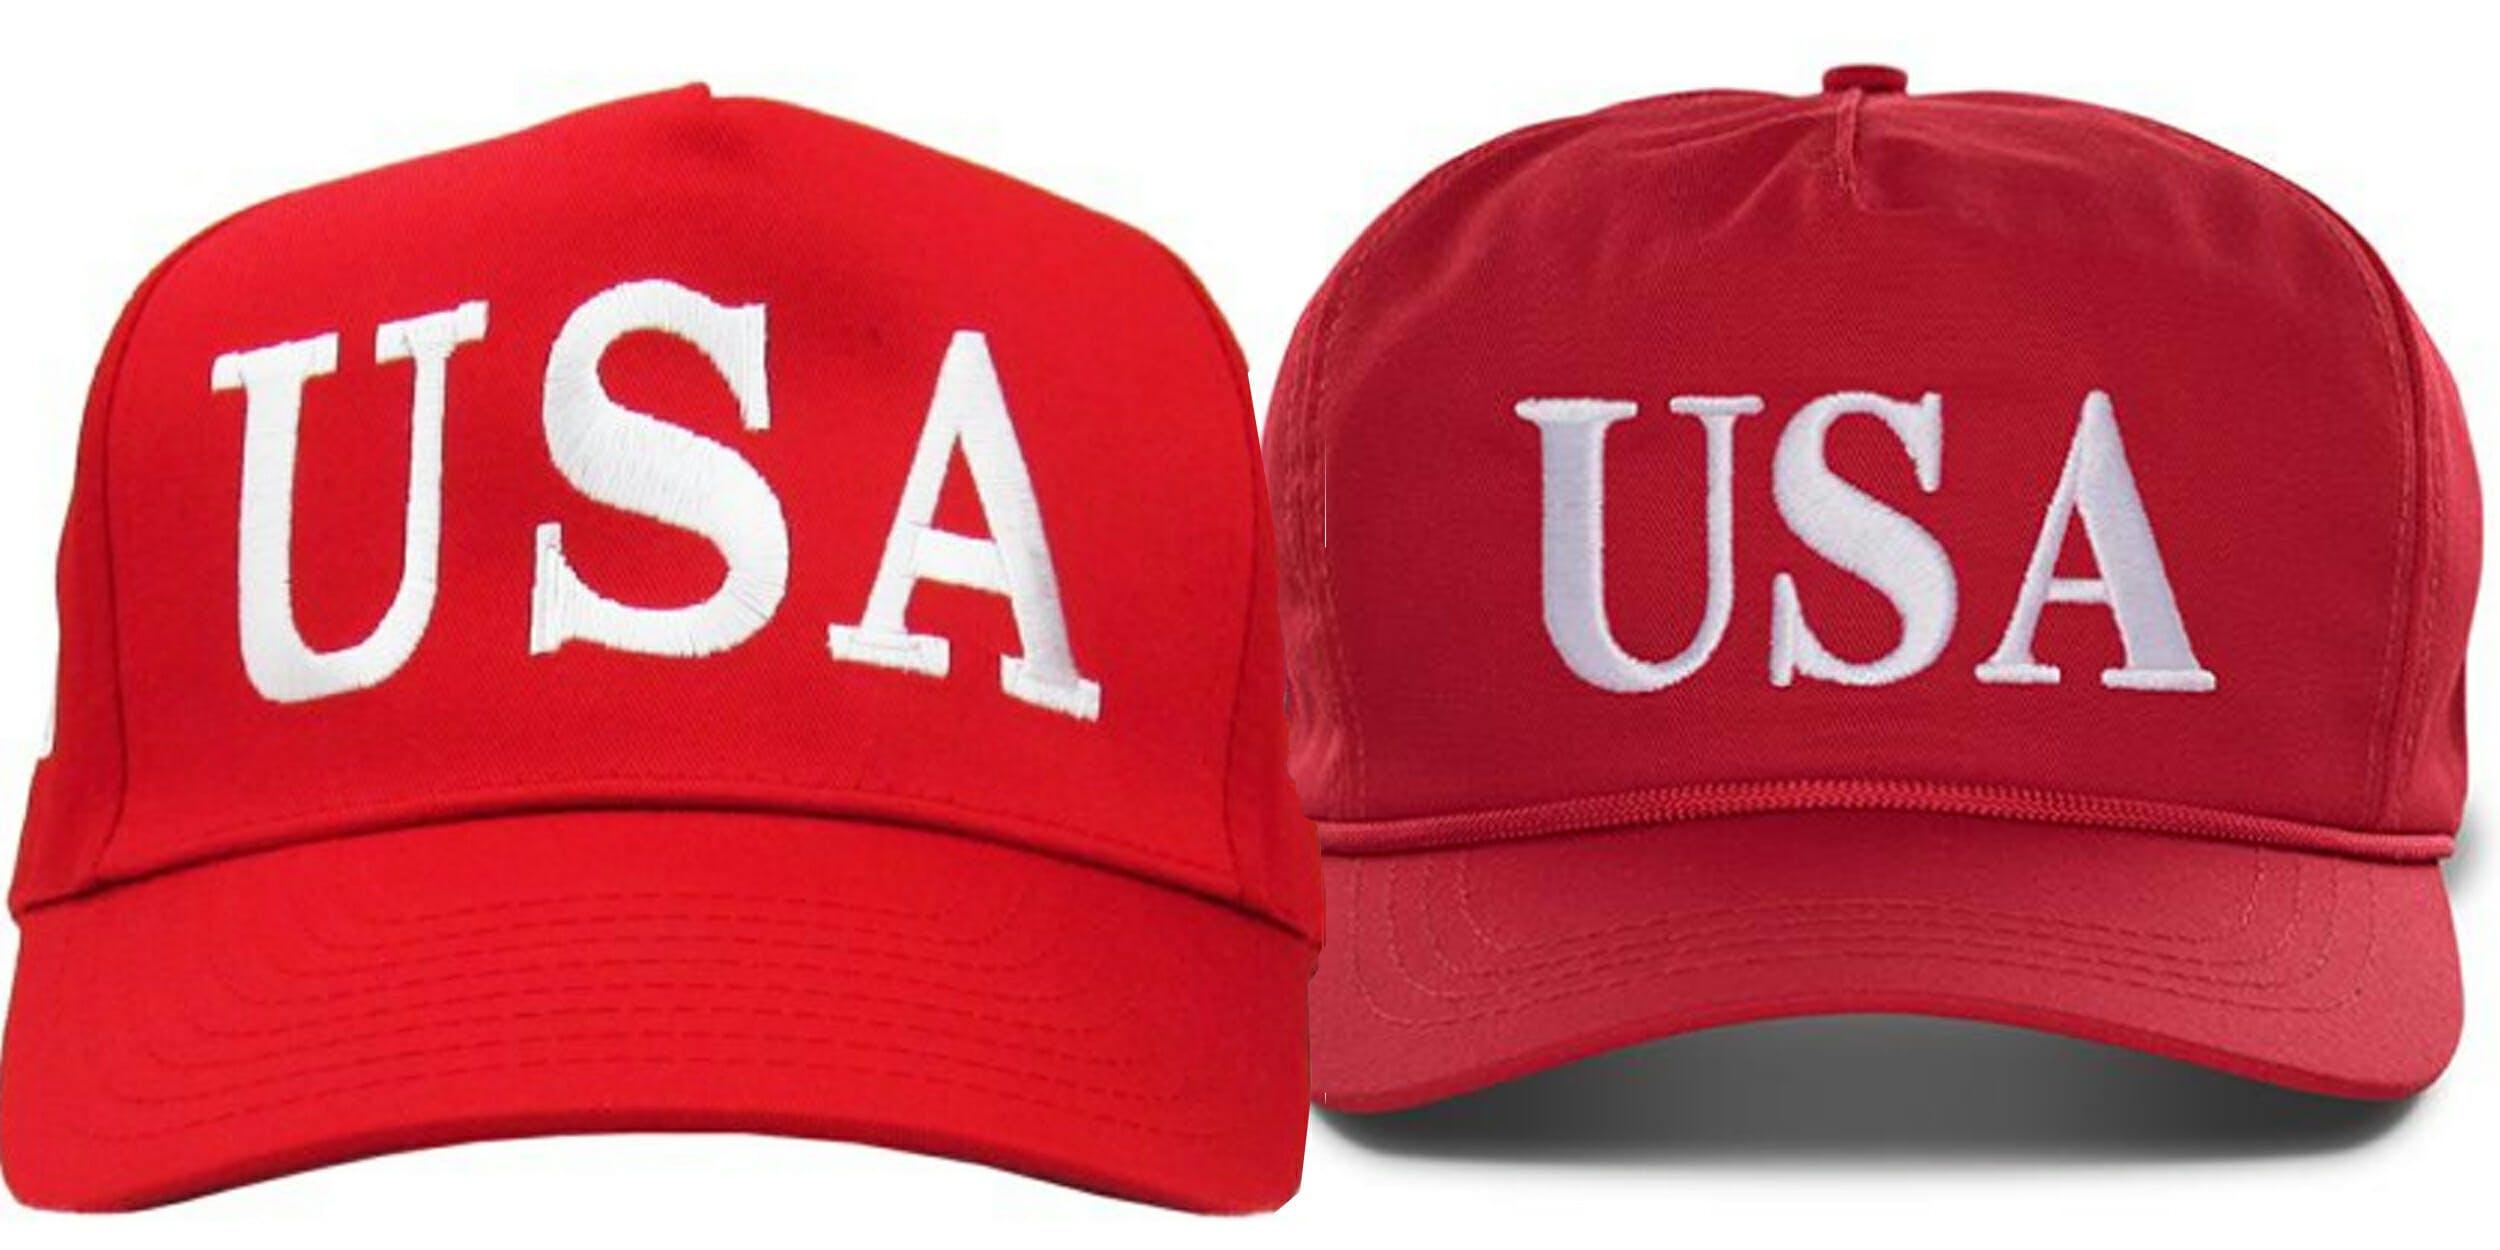 Walmart is selling knockoff Trump 'USA' hats.